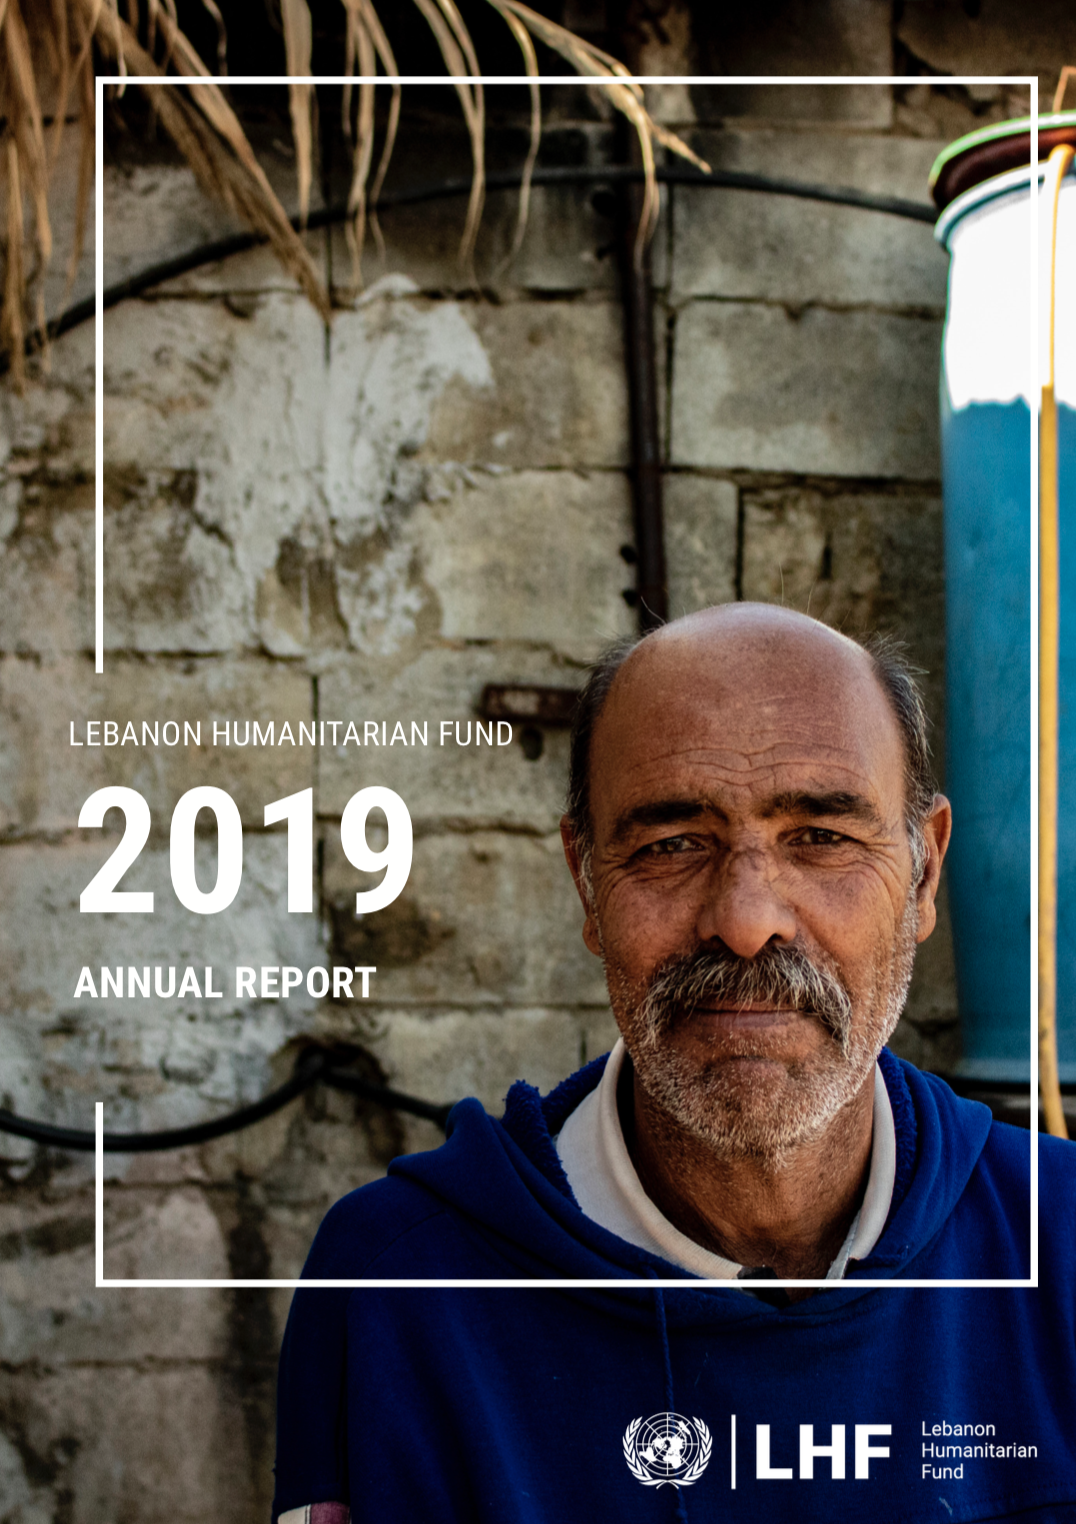 Lebanon Humanitarian Fund 2019